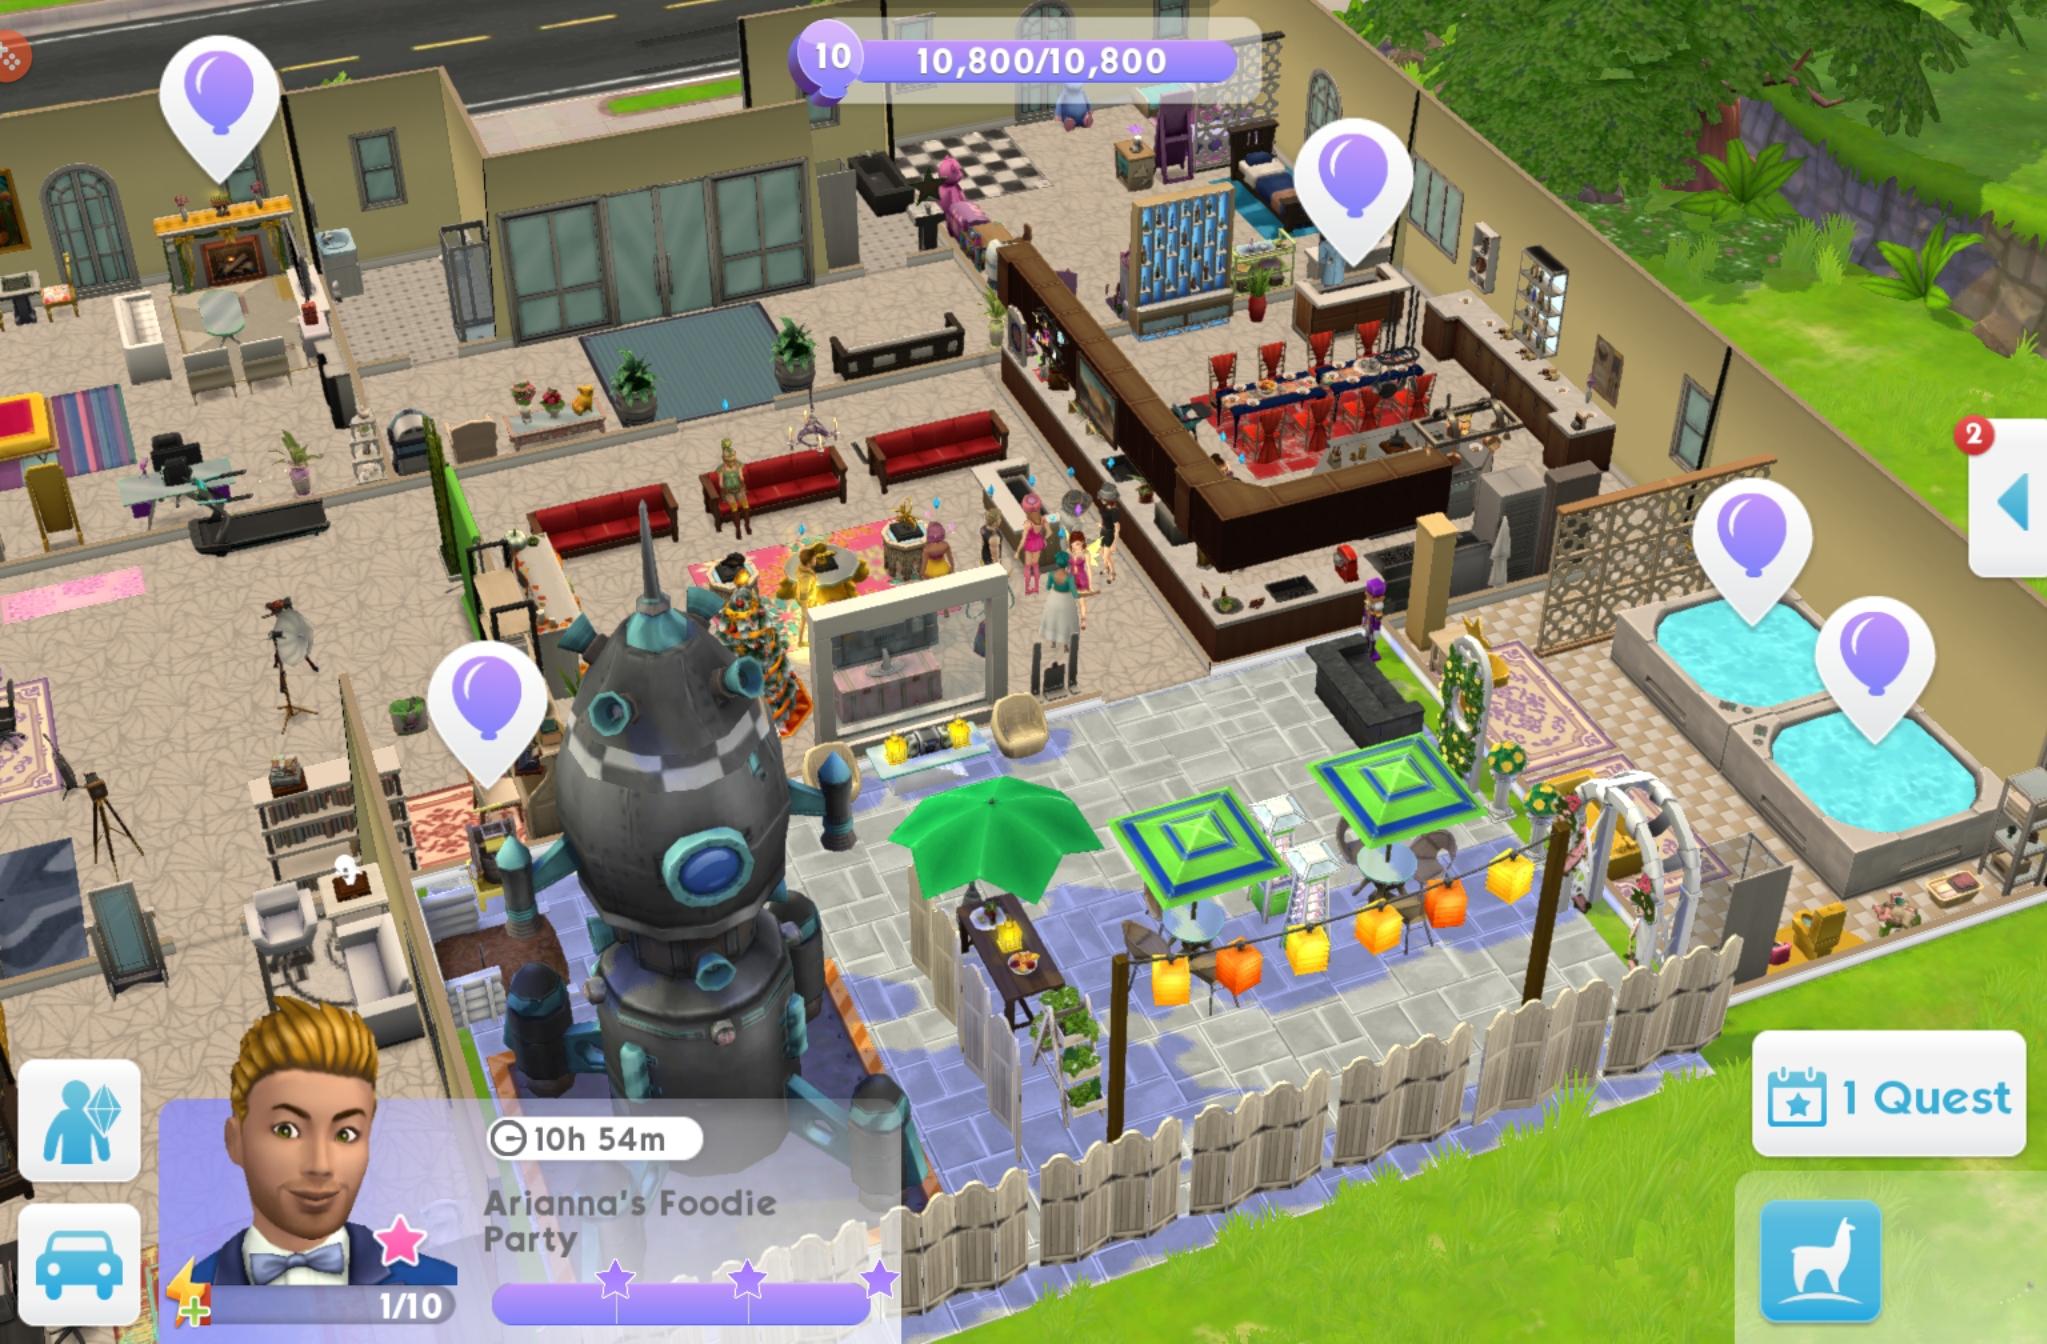 Screenshot_20190217-144405_The Sims.jpg